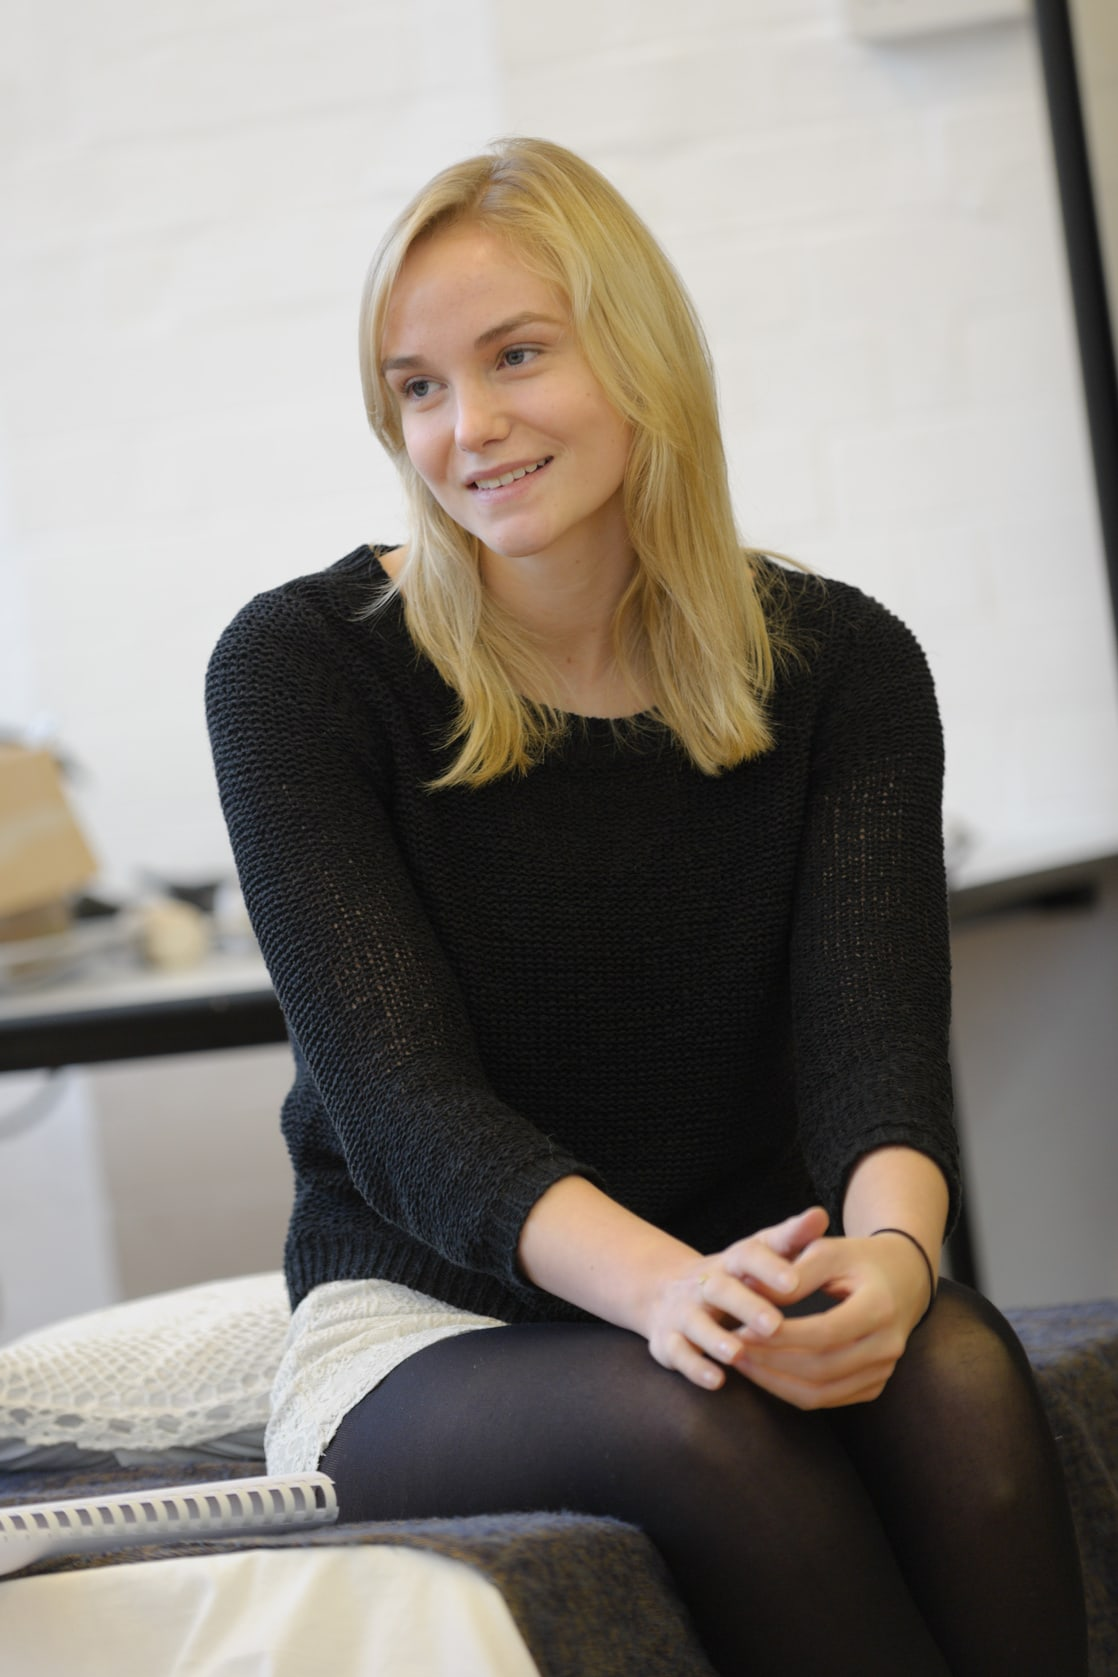 foto Joanna Vanderham (born 1992)